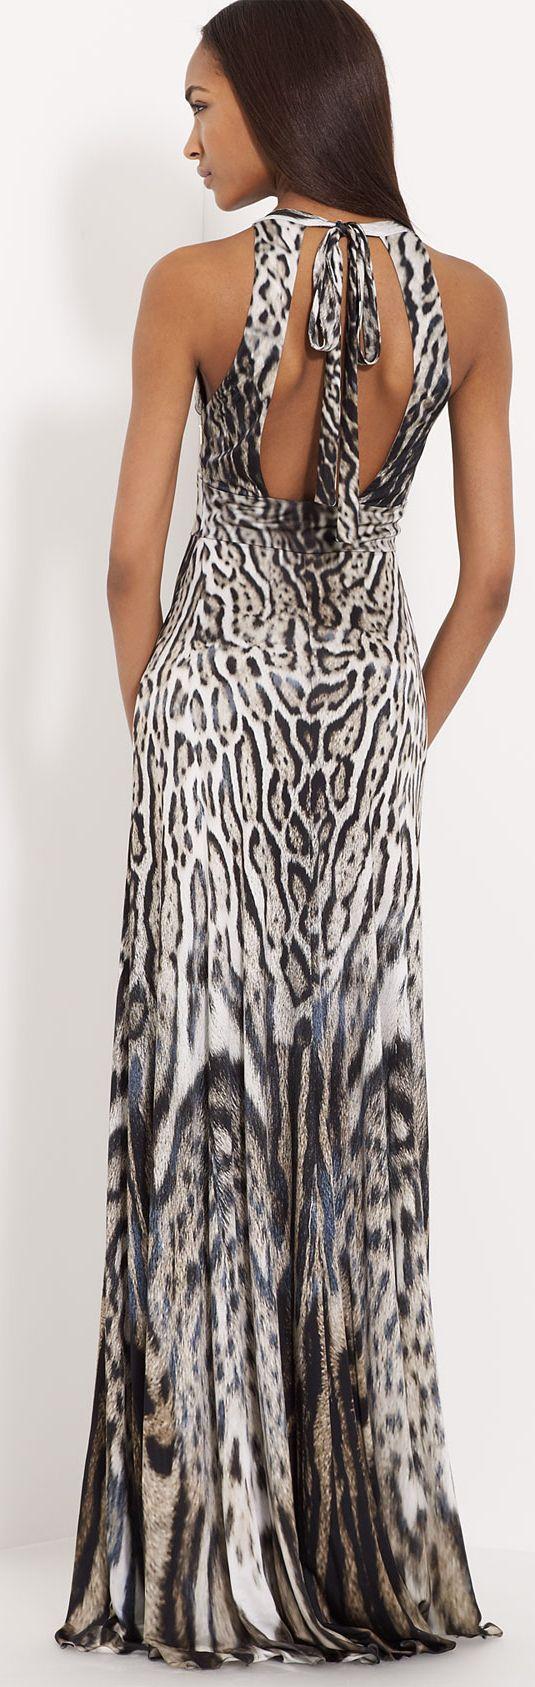 Roberto Cavalli   Leopard Print Jersey Gown